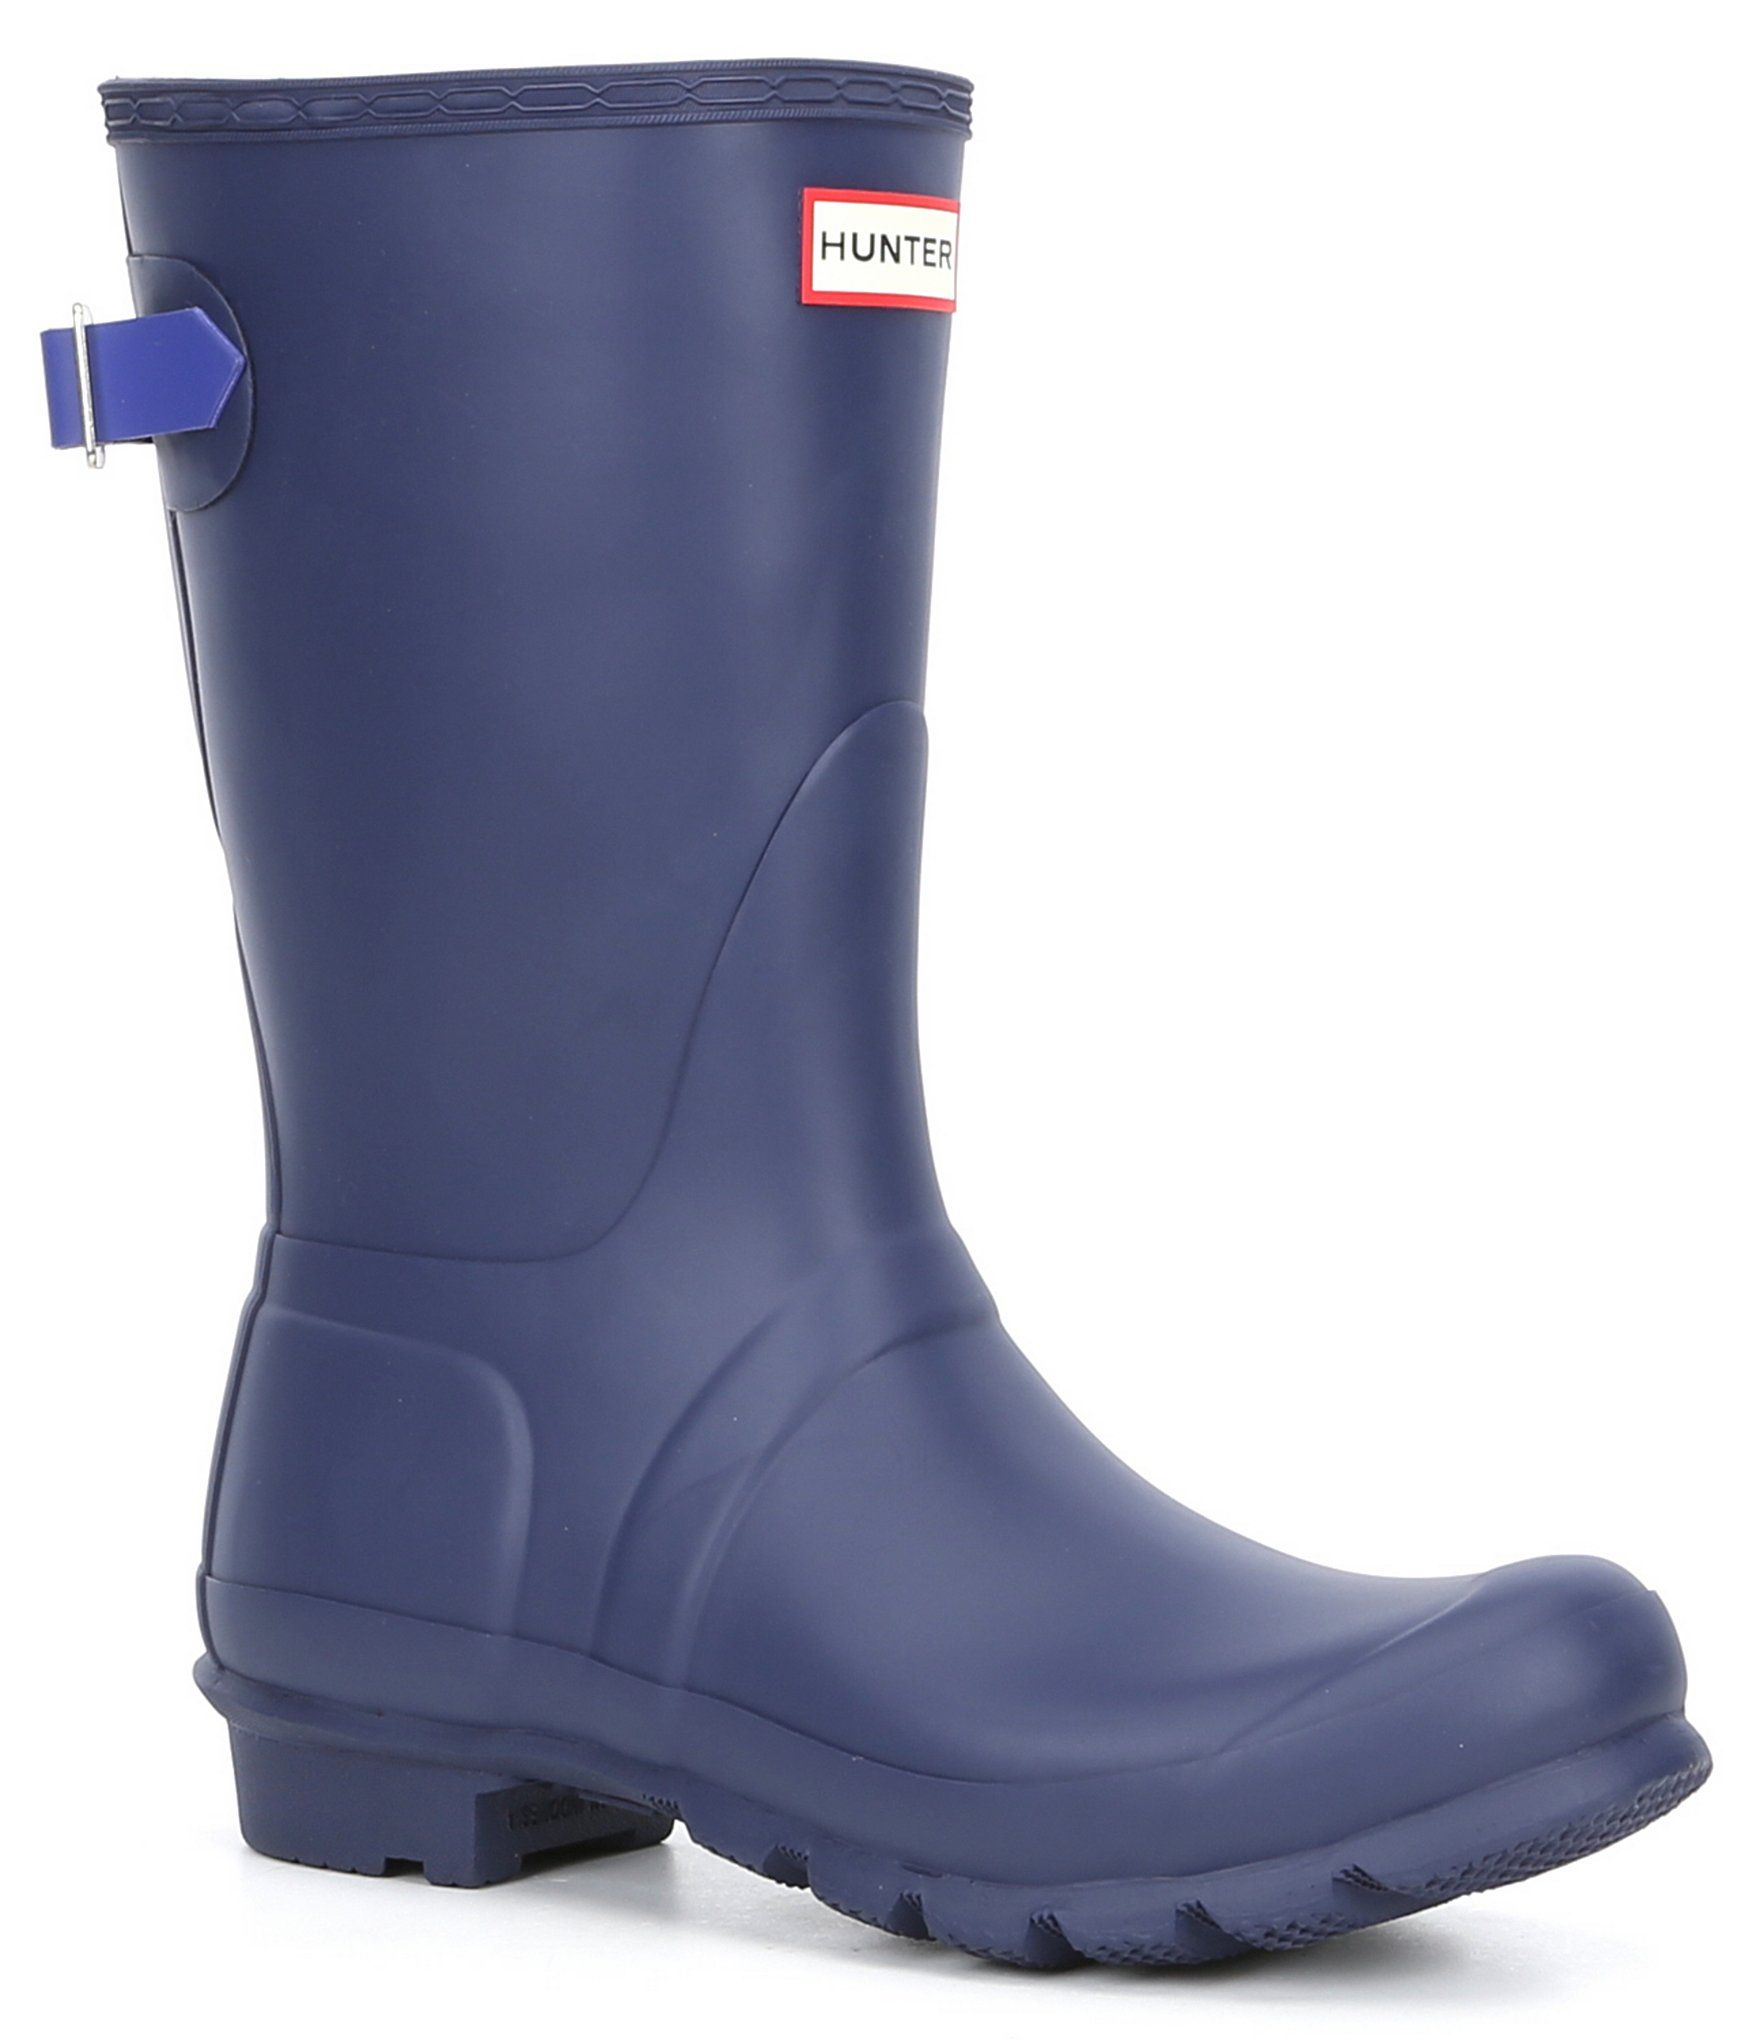 Hunter Original Short Adjustable Back Matte Rain Boots - Melody Electric Storm 9M